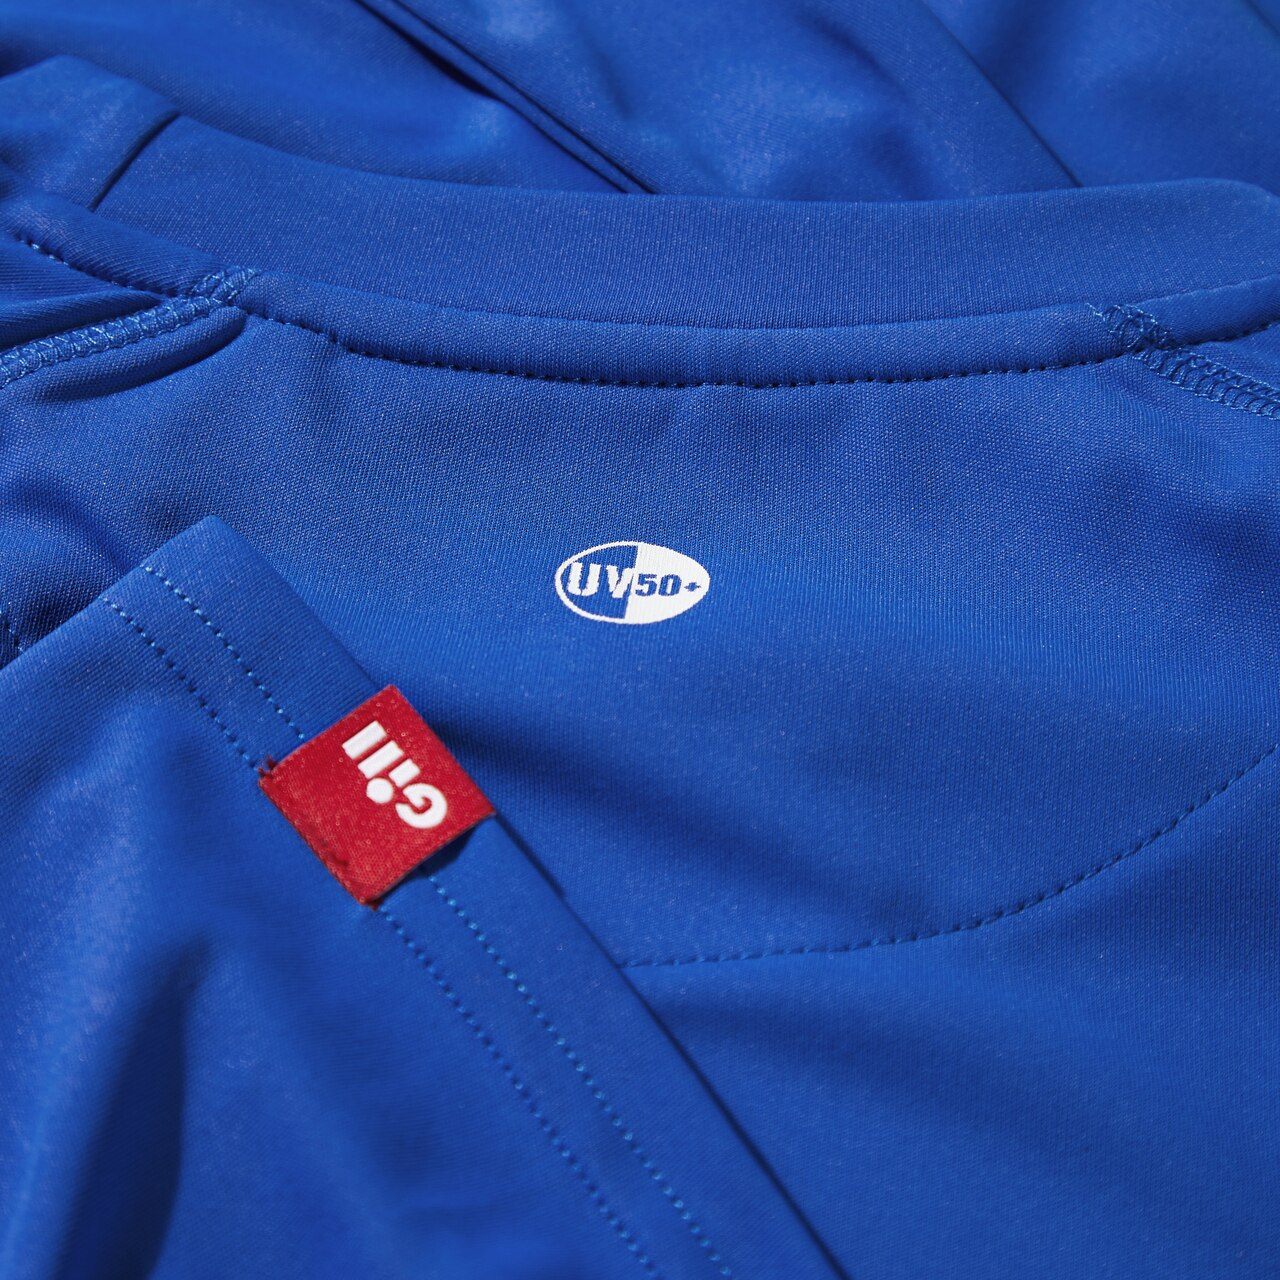 Men's UV Tec Long Sleeve Tee - UV011-BLU01-5.jpg